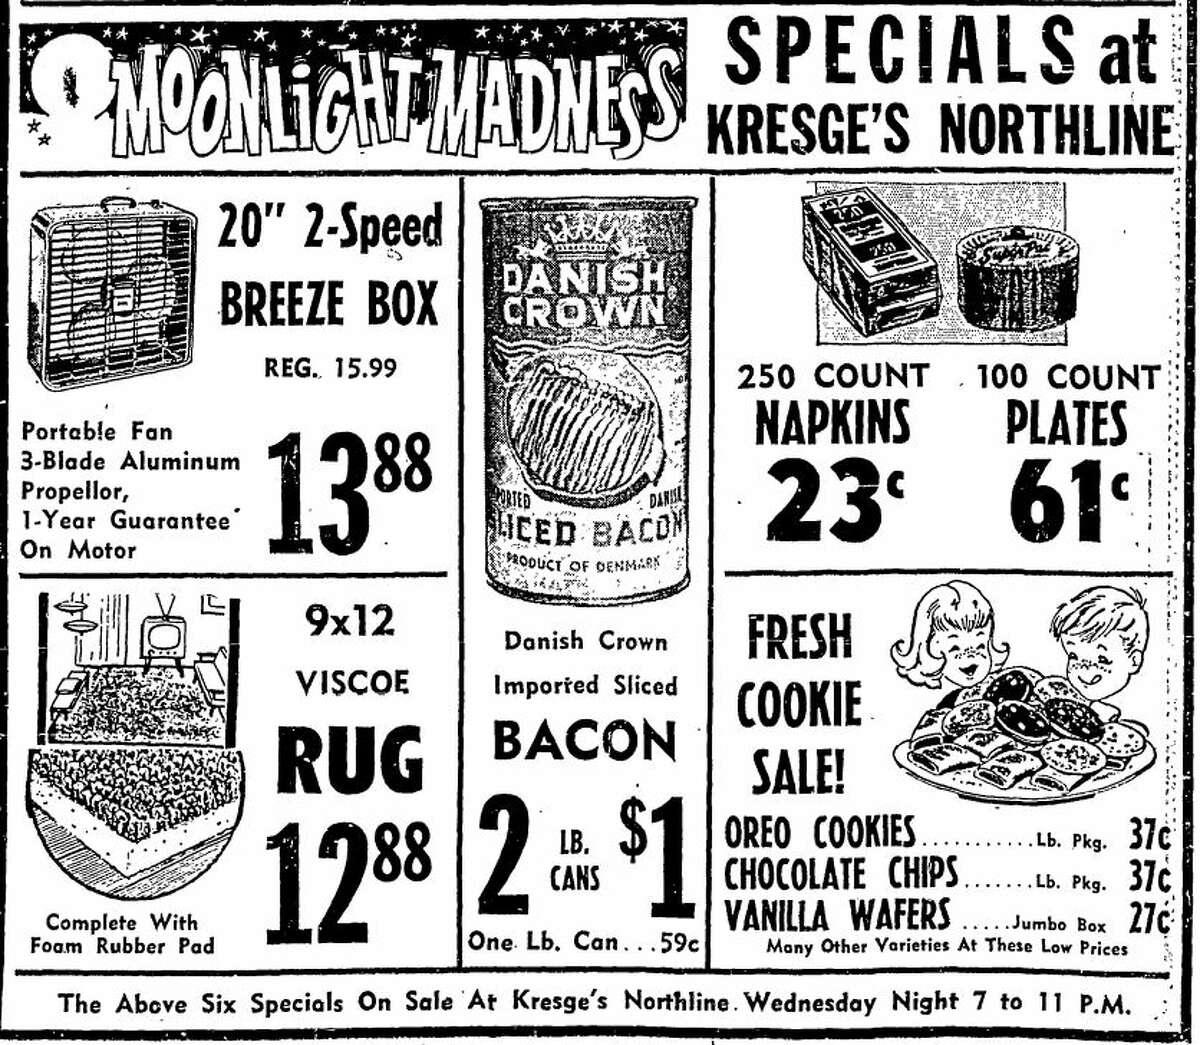 S.S. Kresge ad, 1964